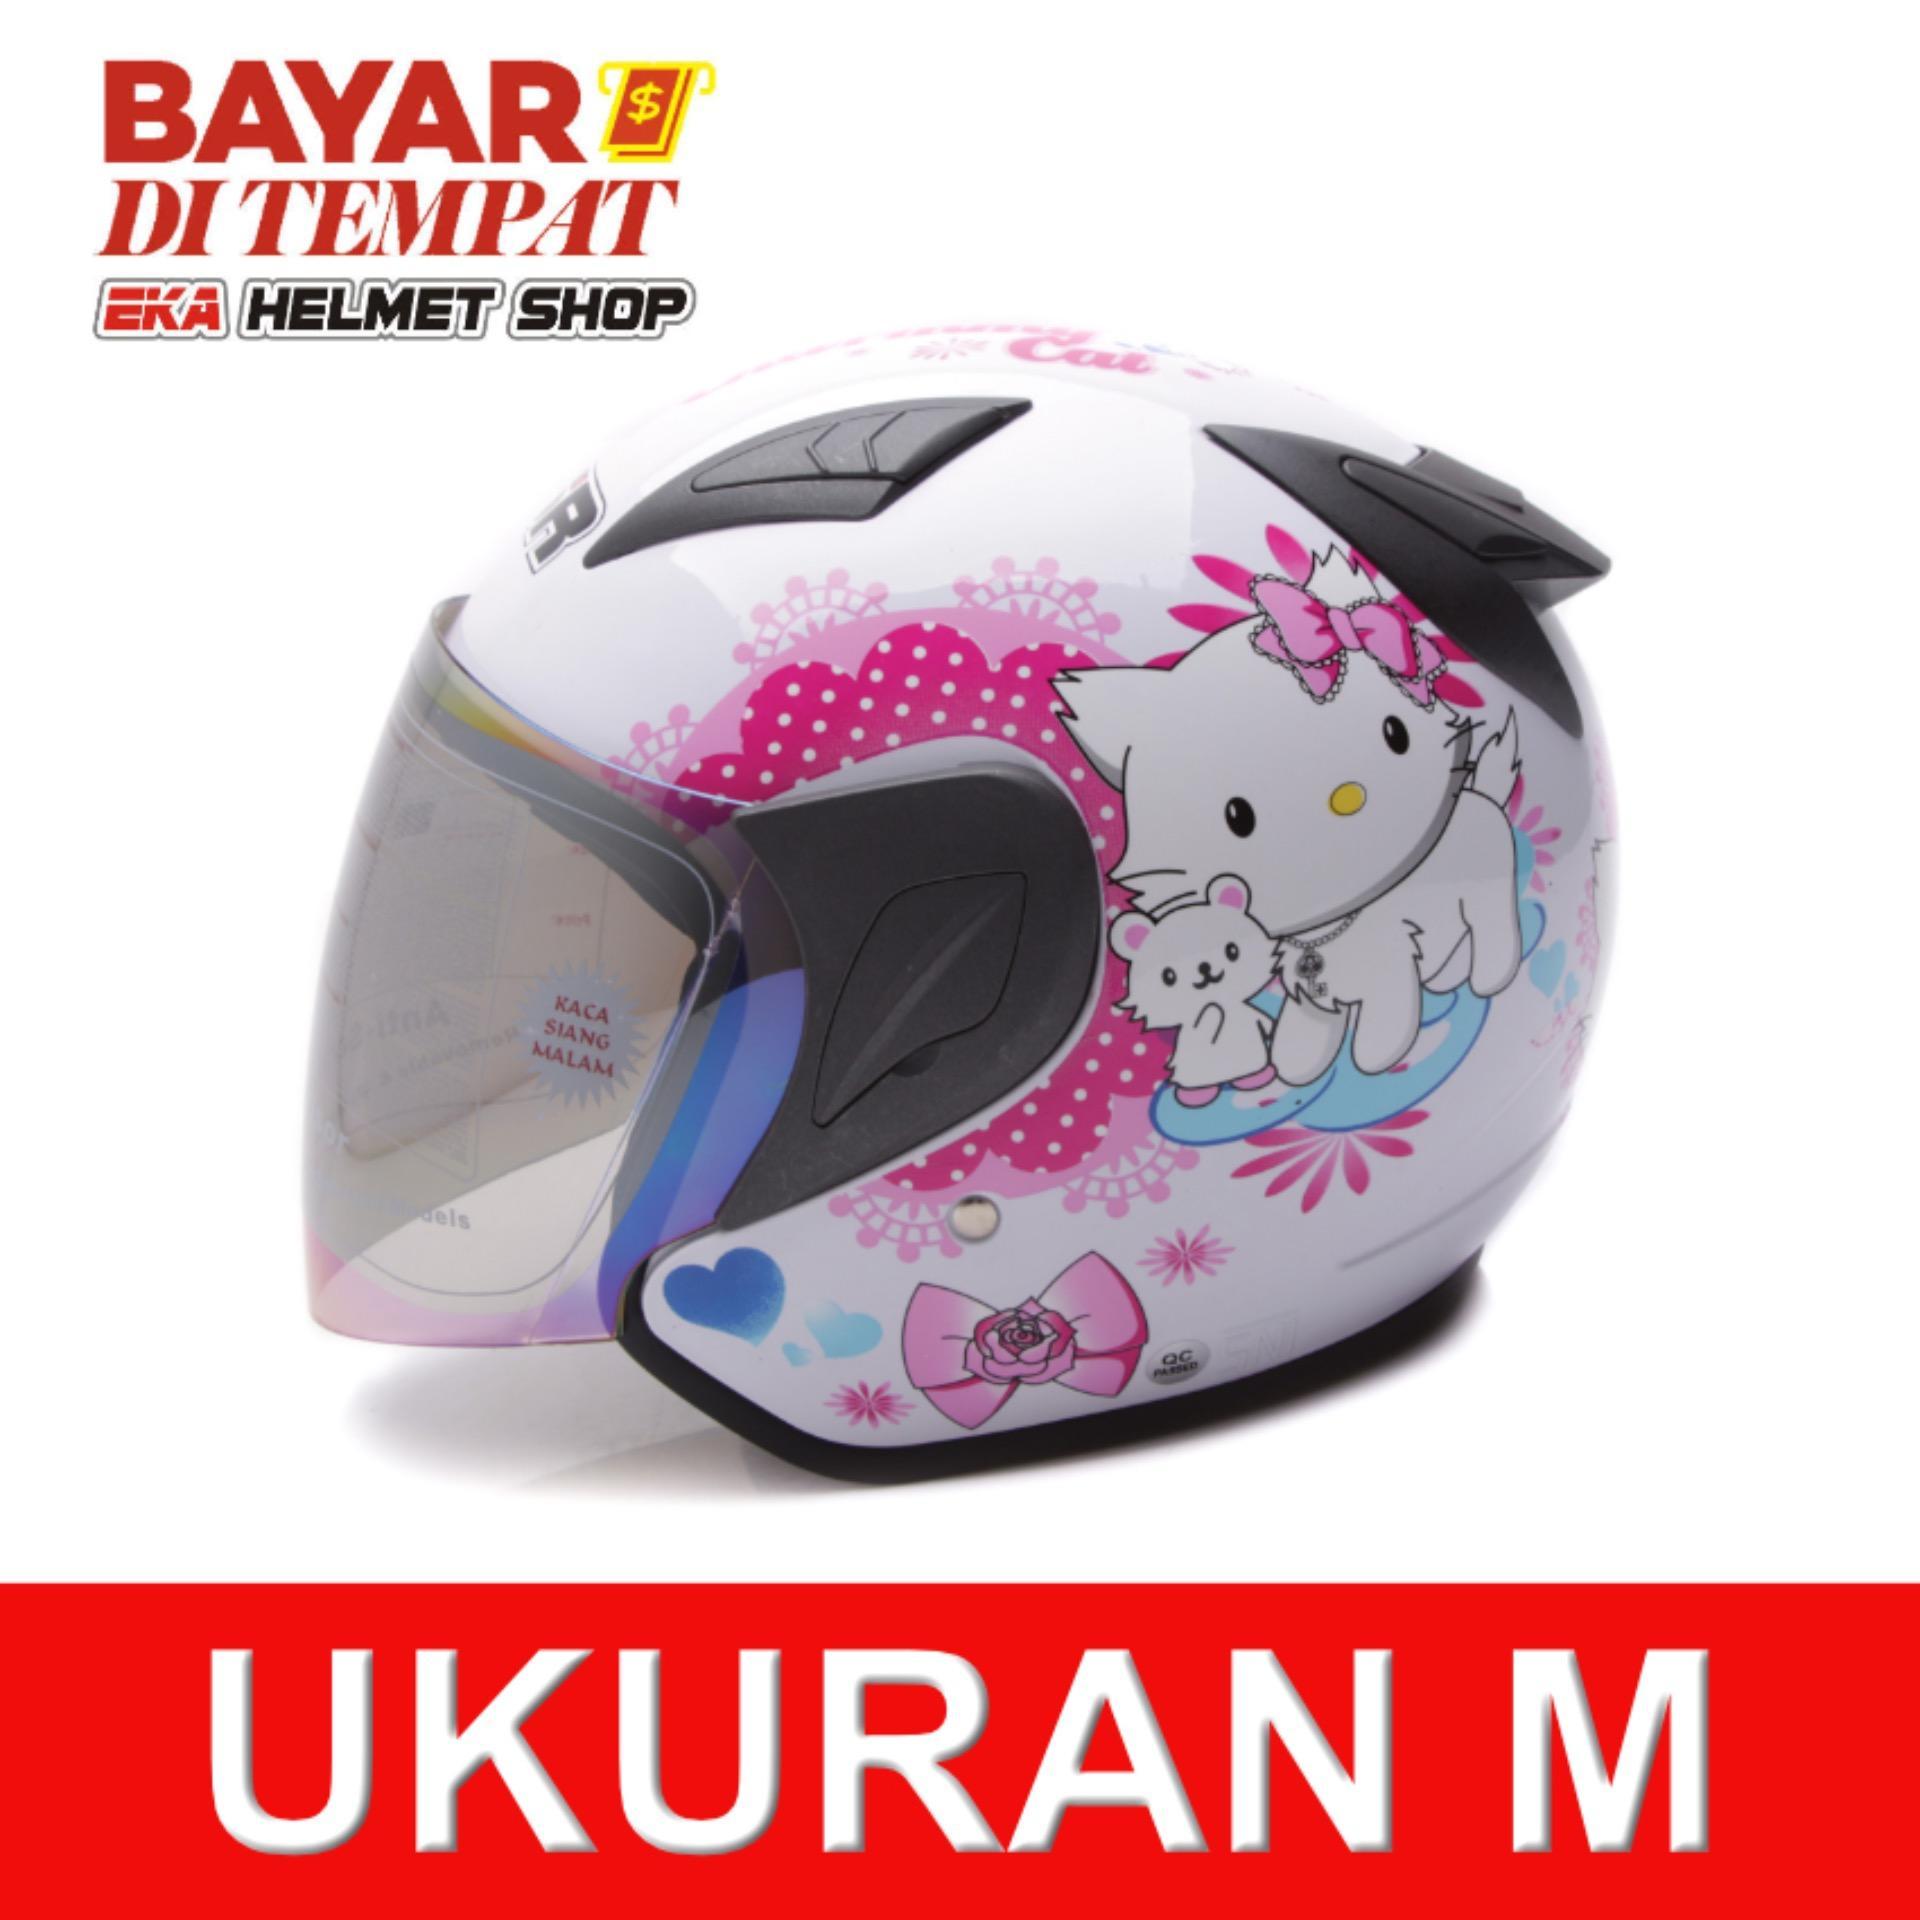 Toko Msr Helmet Javelin Charmmy Putih Terlengkap Banten